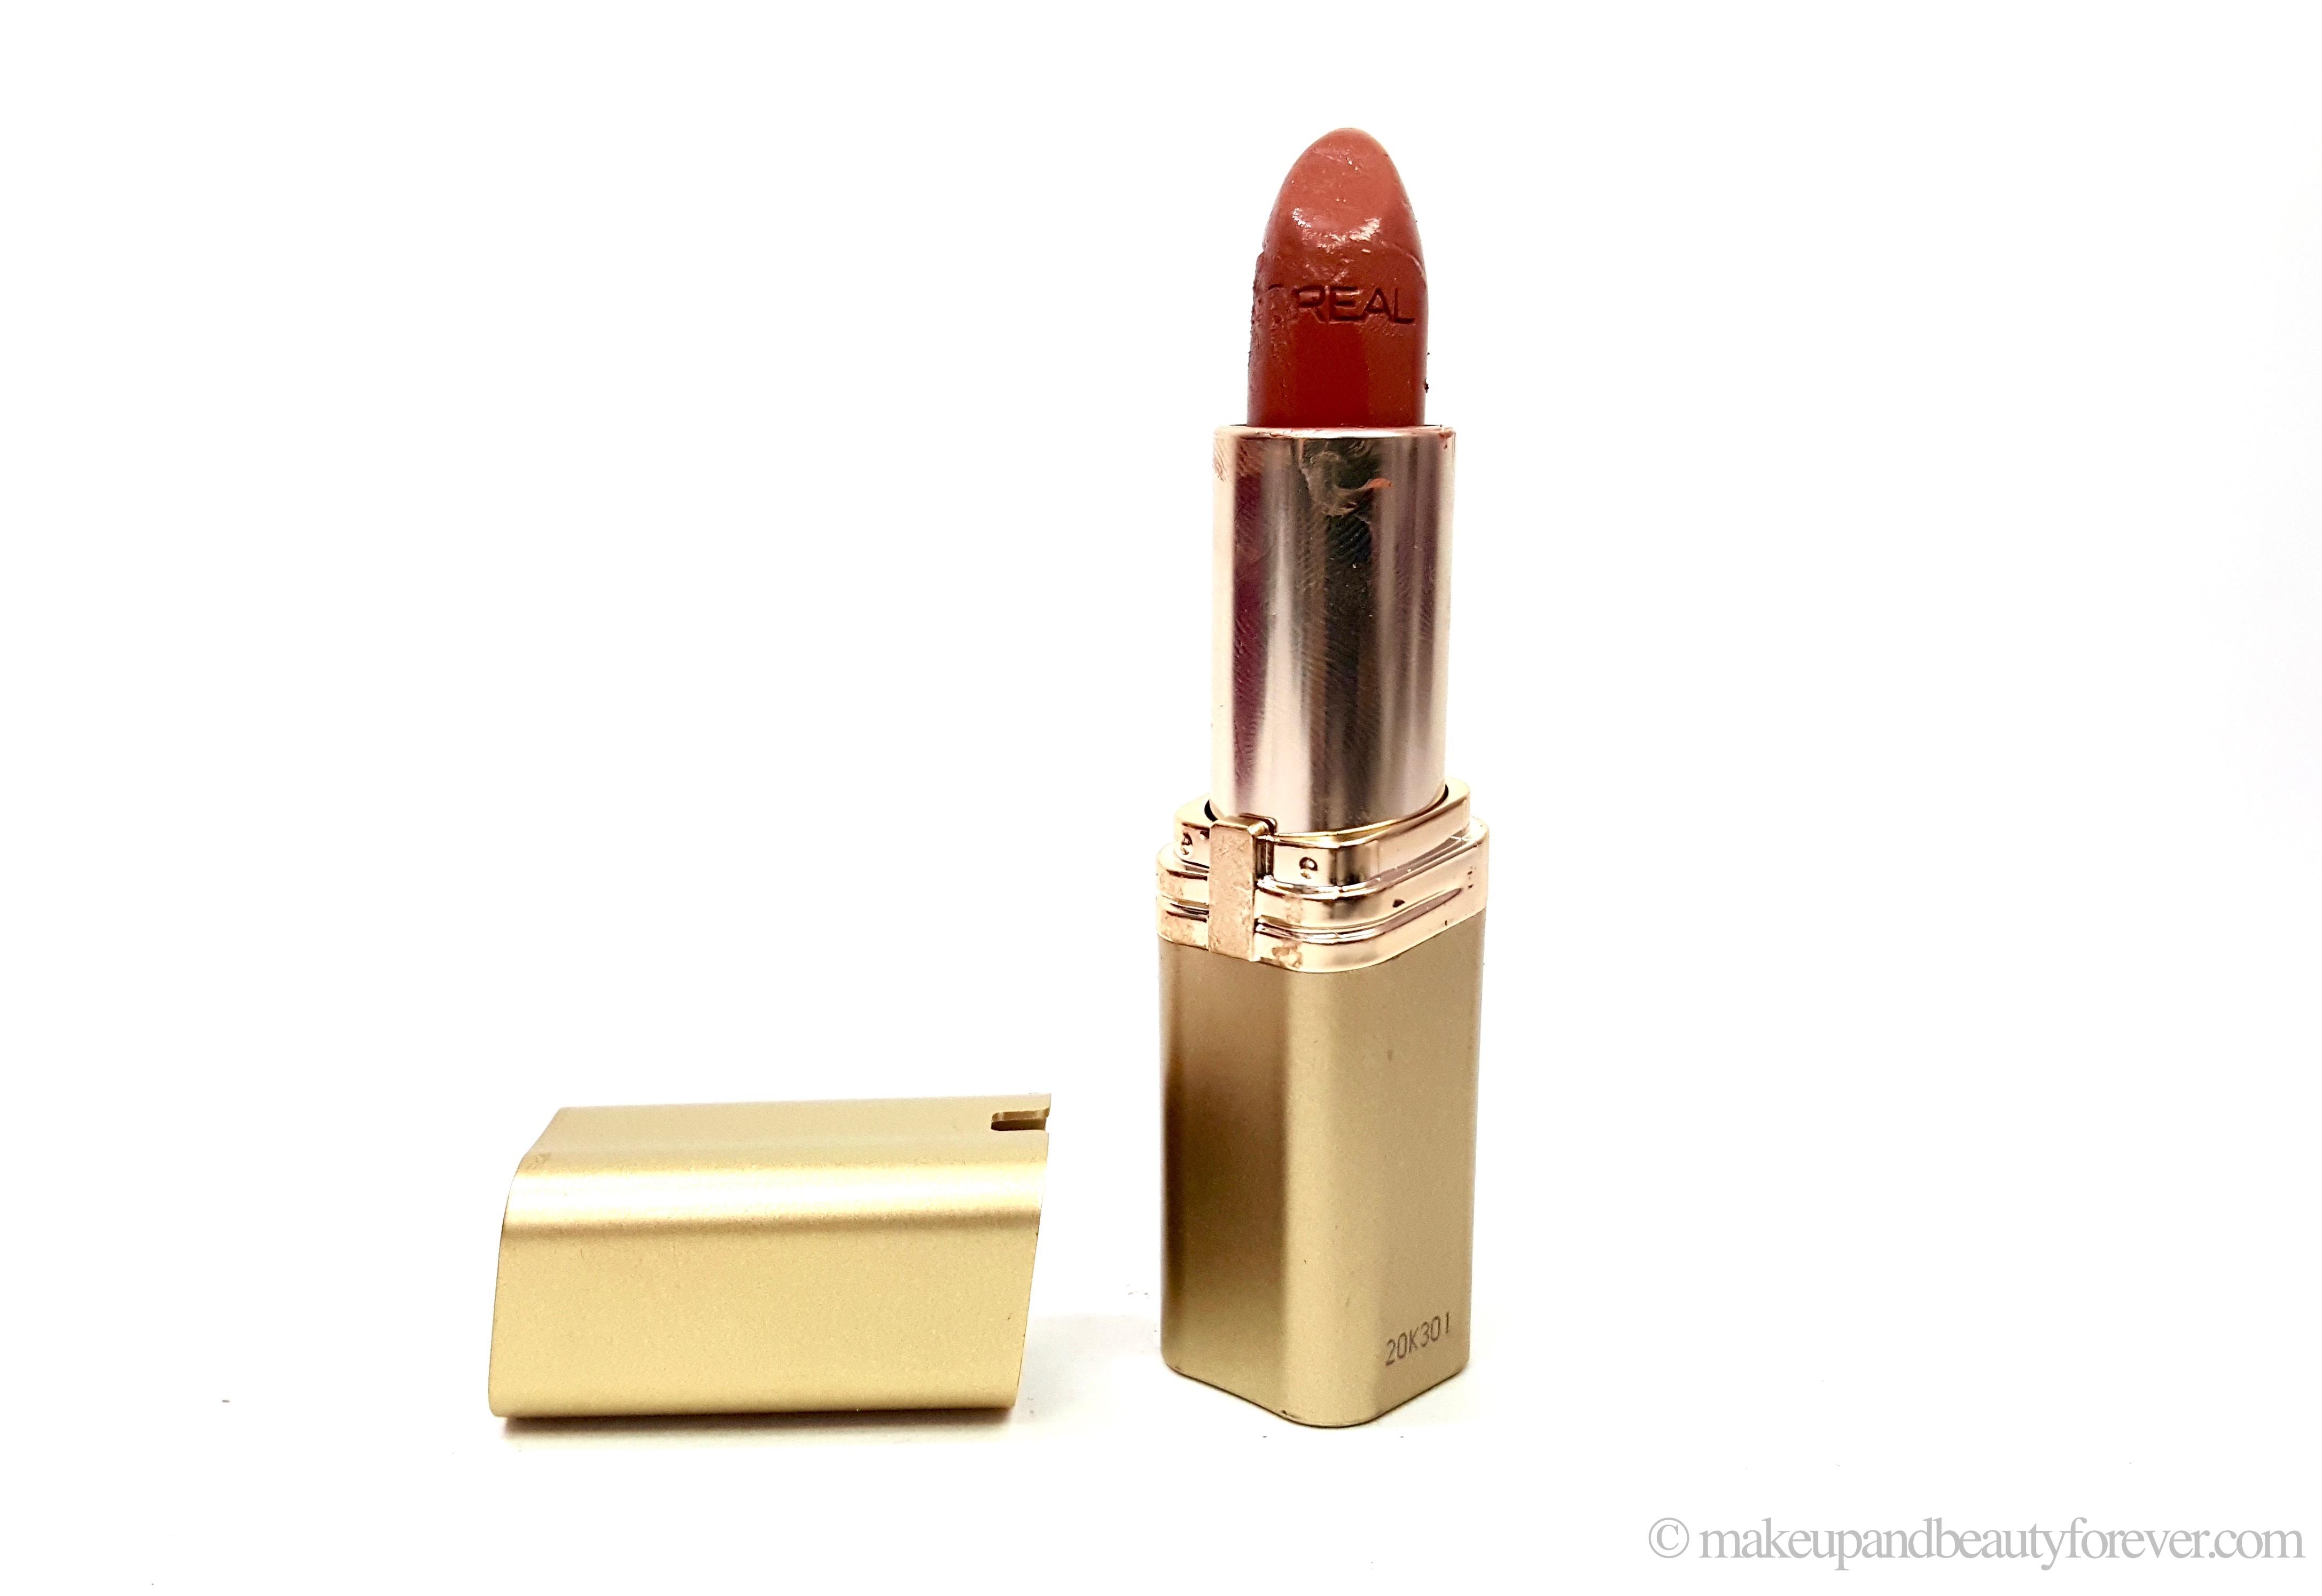 L'Oreal Color Riche Lipstick 840 Nature's Blush Review, Swatches